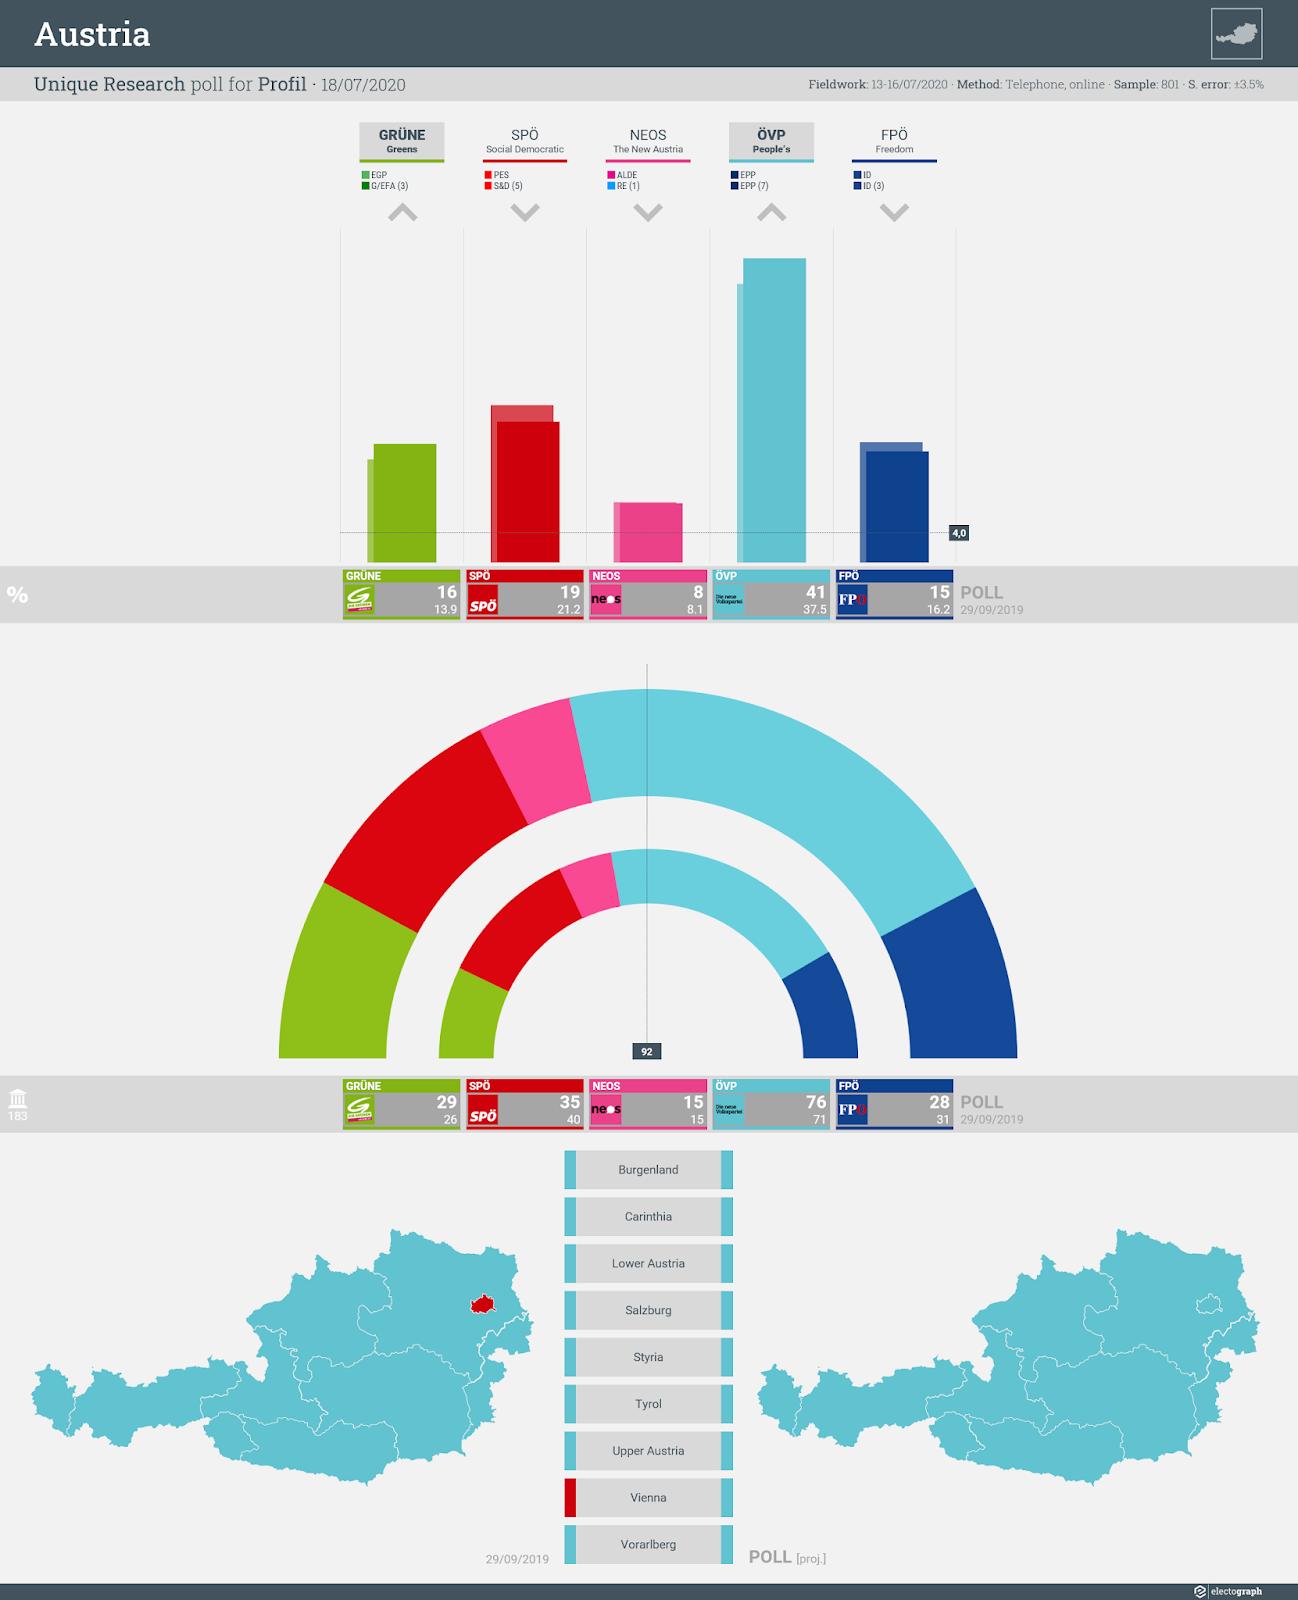 AUSTRIA: Unique Research poll chart for Profil, 18 July 2020